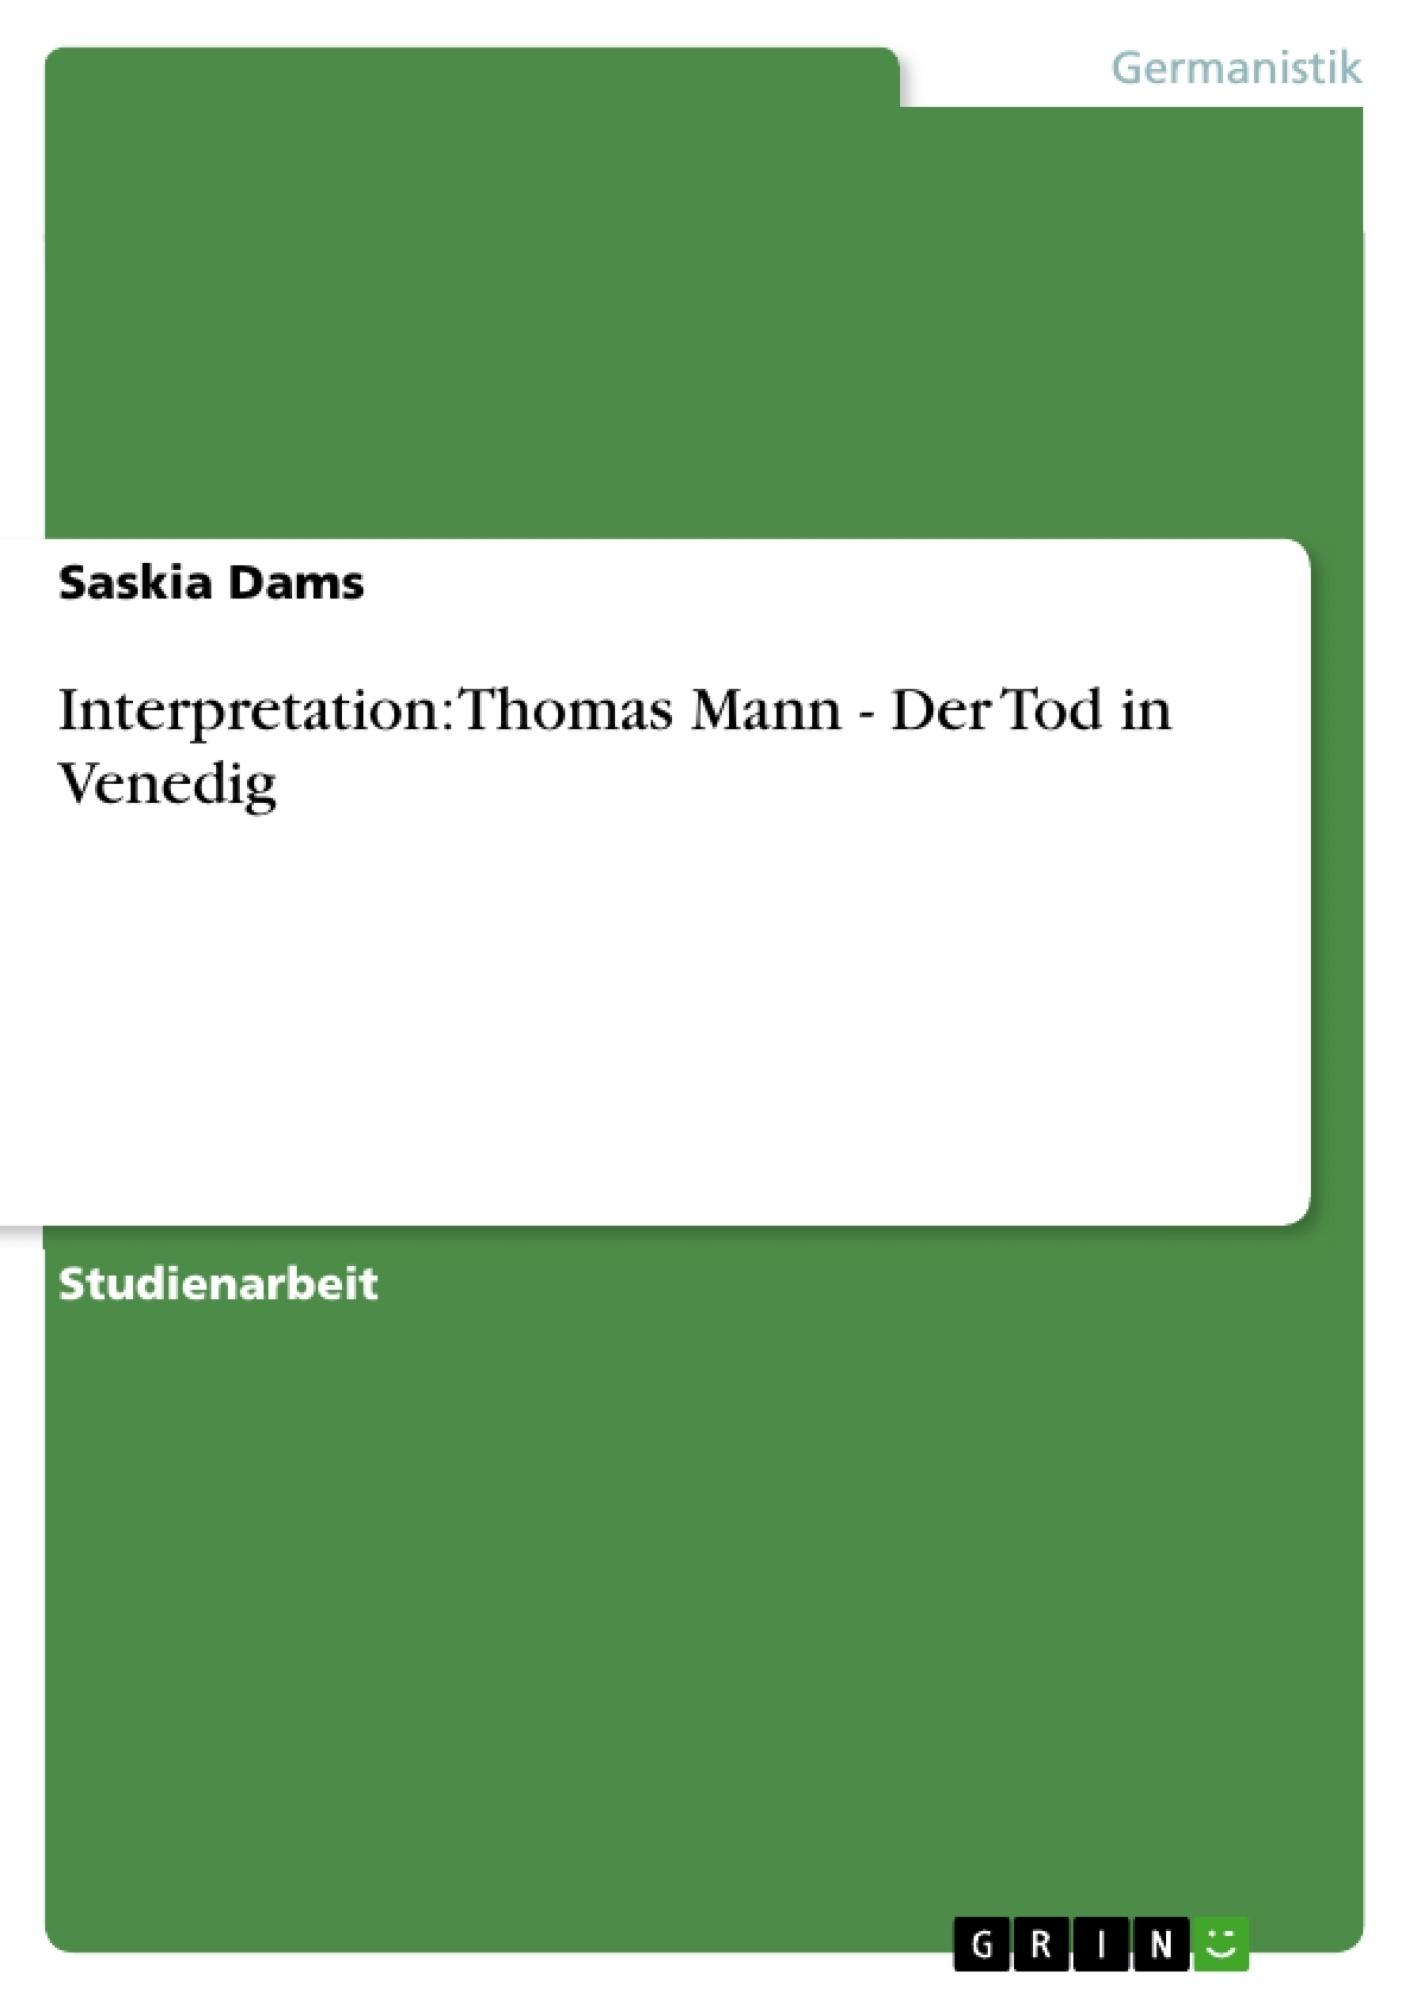 Titel: Interpretation: Thomas Mann - Der Tod in Venedig